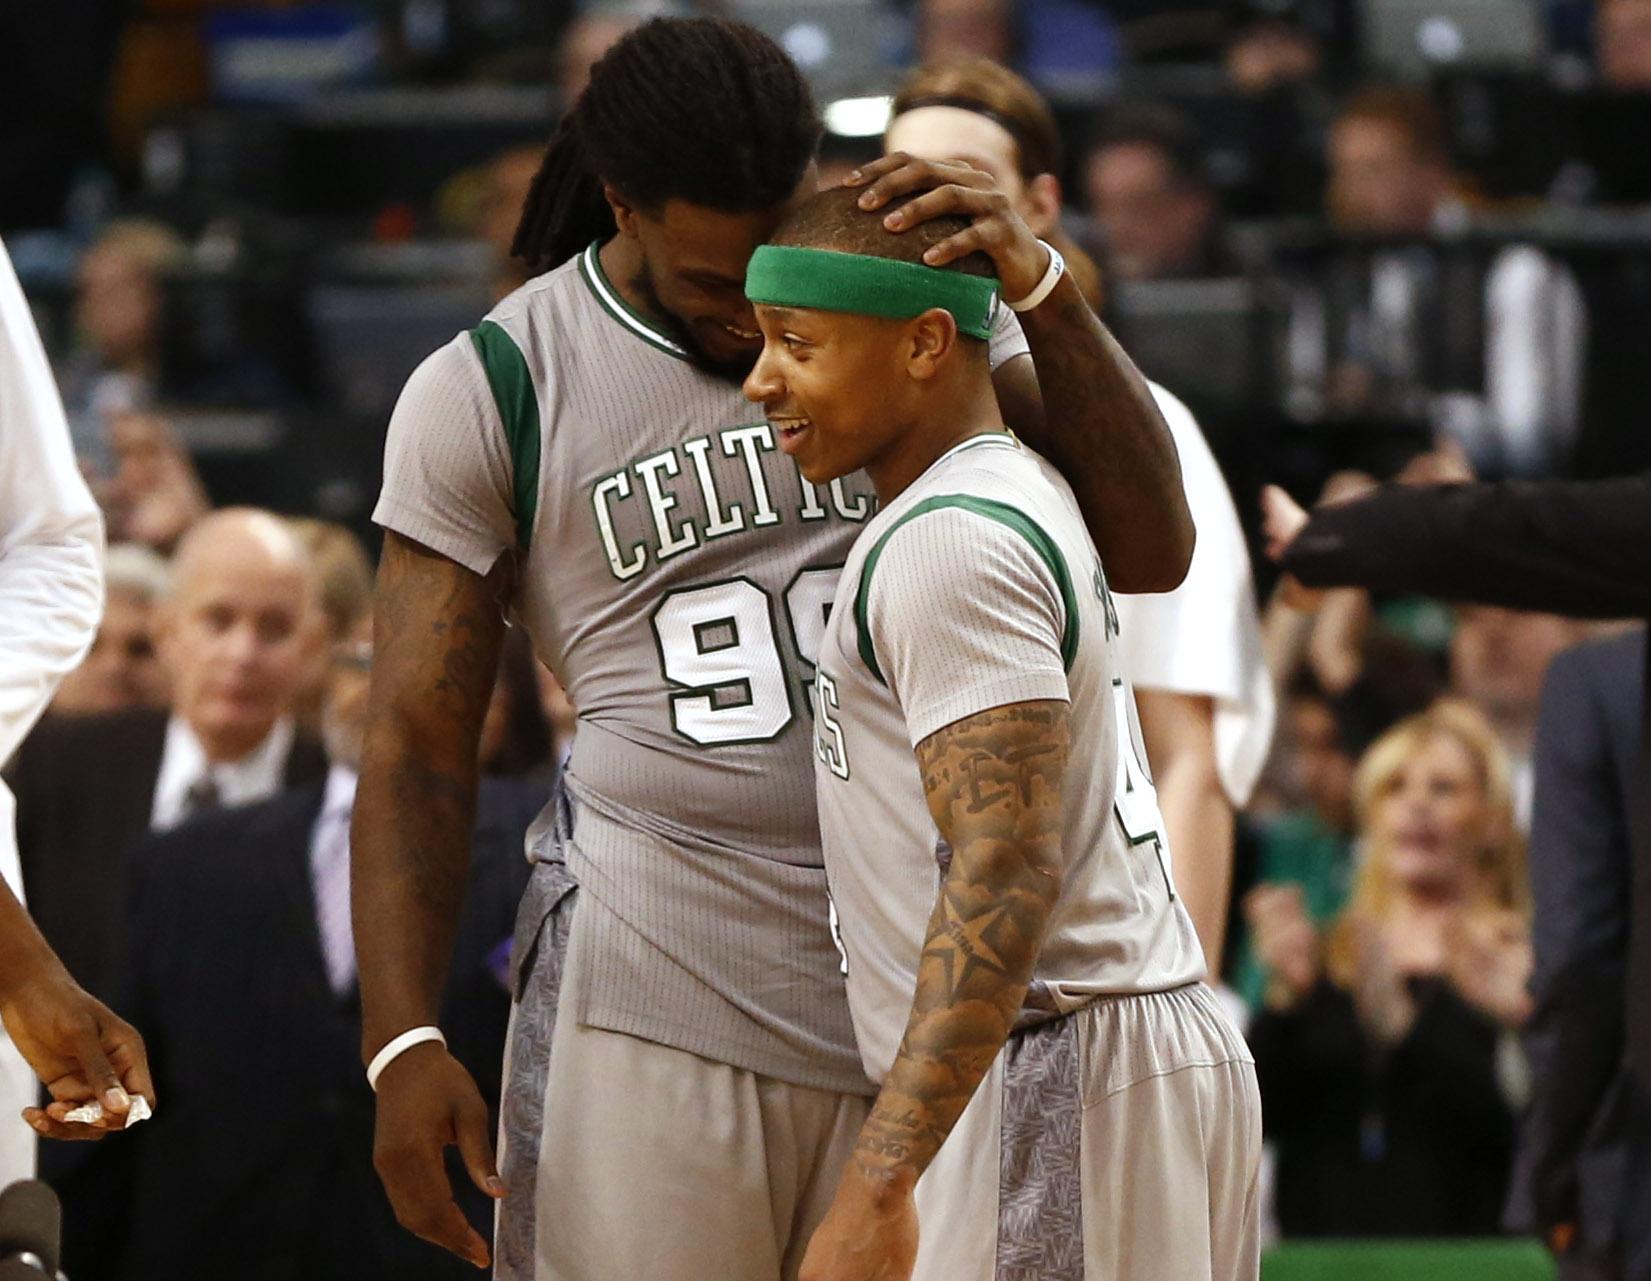 Celtics clinch No. 1 seed in East, beat Bucks 112-94